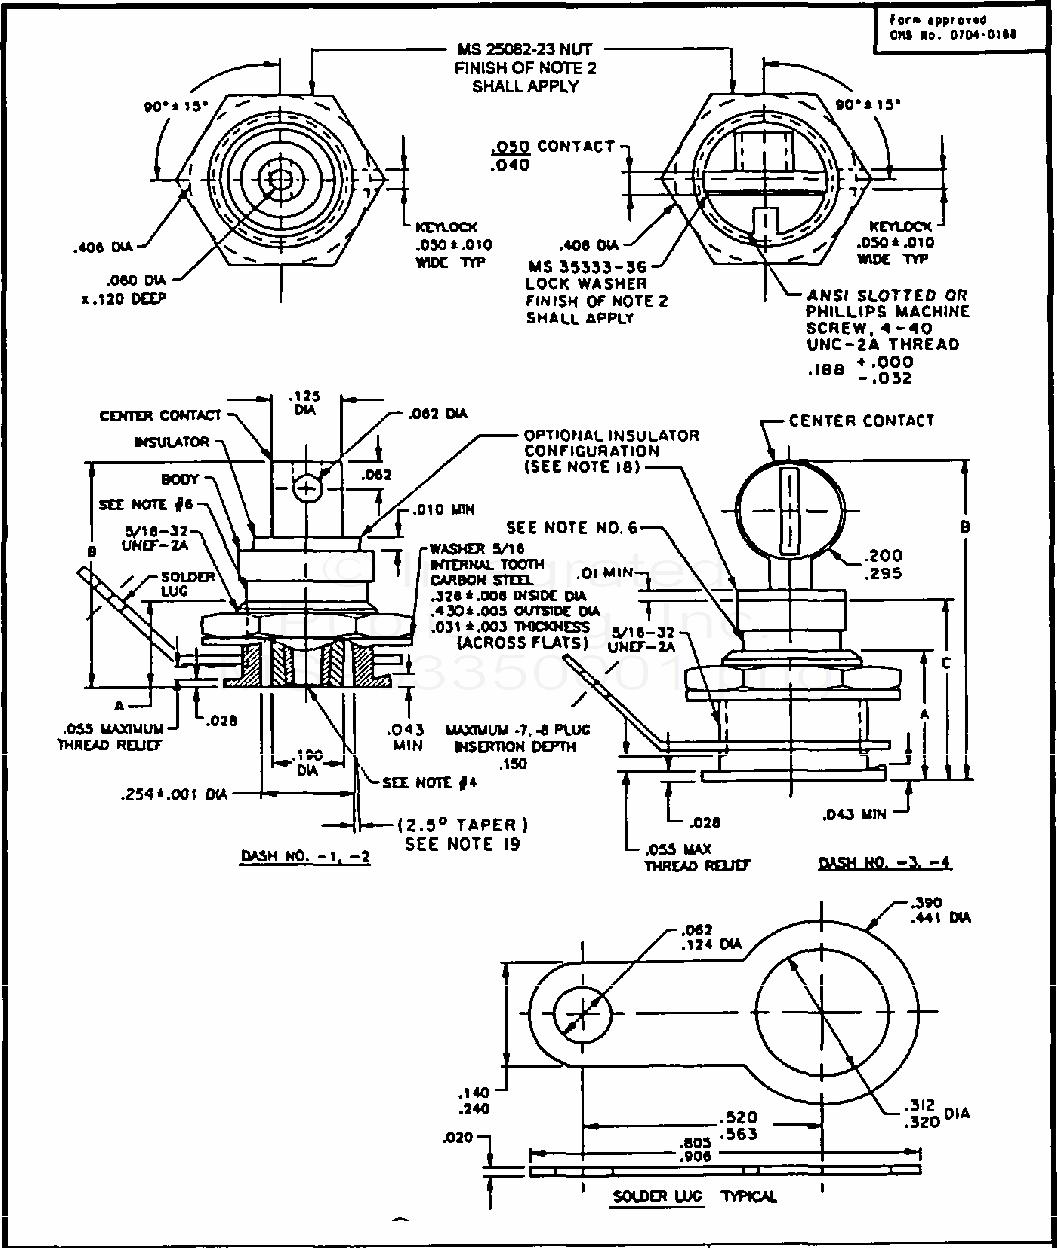 MS90335 Connector, Receptacles, Plugs, Adapter, El